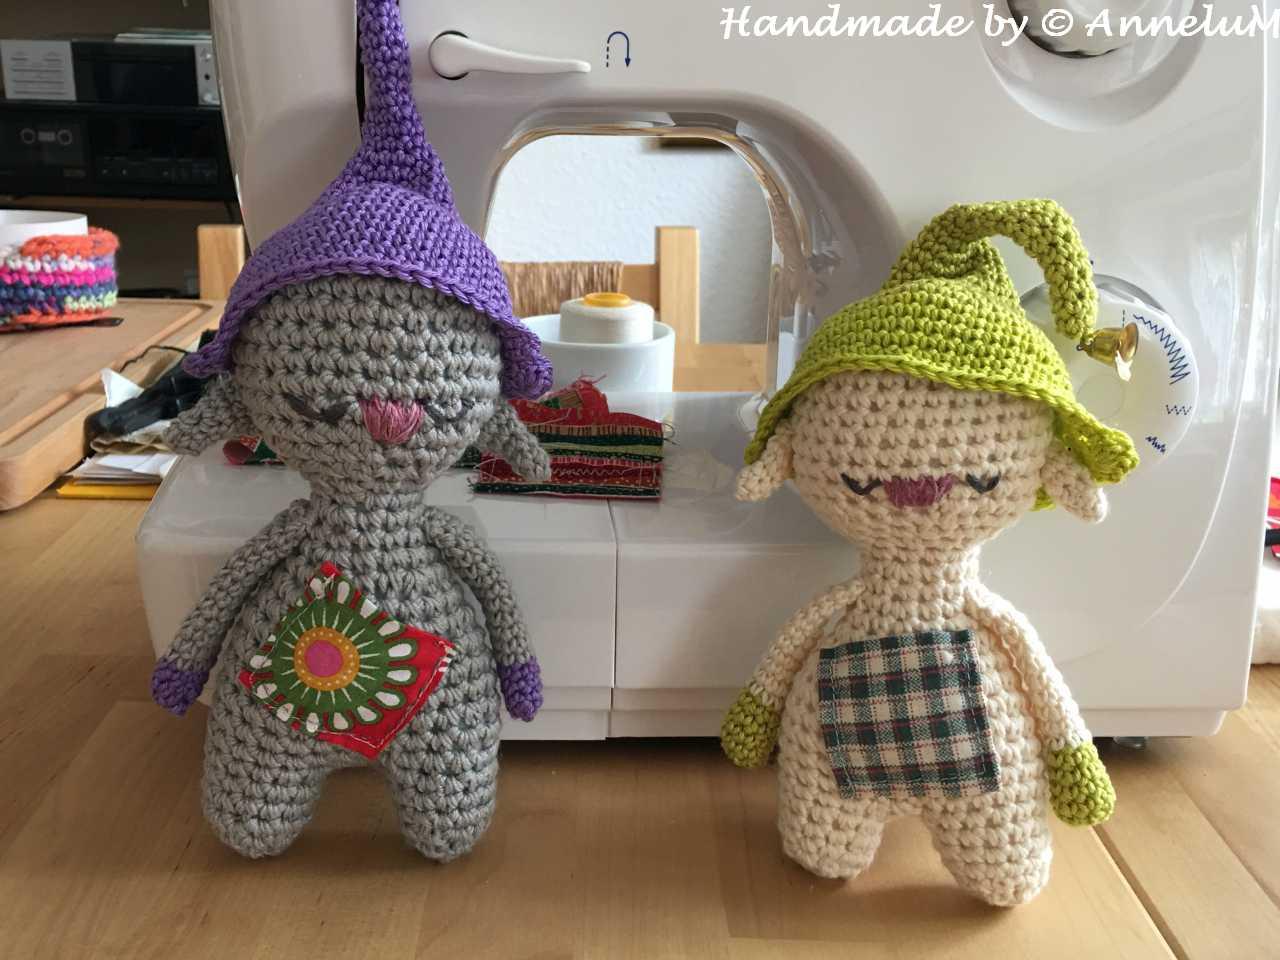 Wonneproppen Happy Handmade by AnneluM